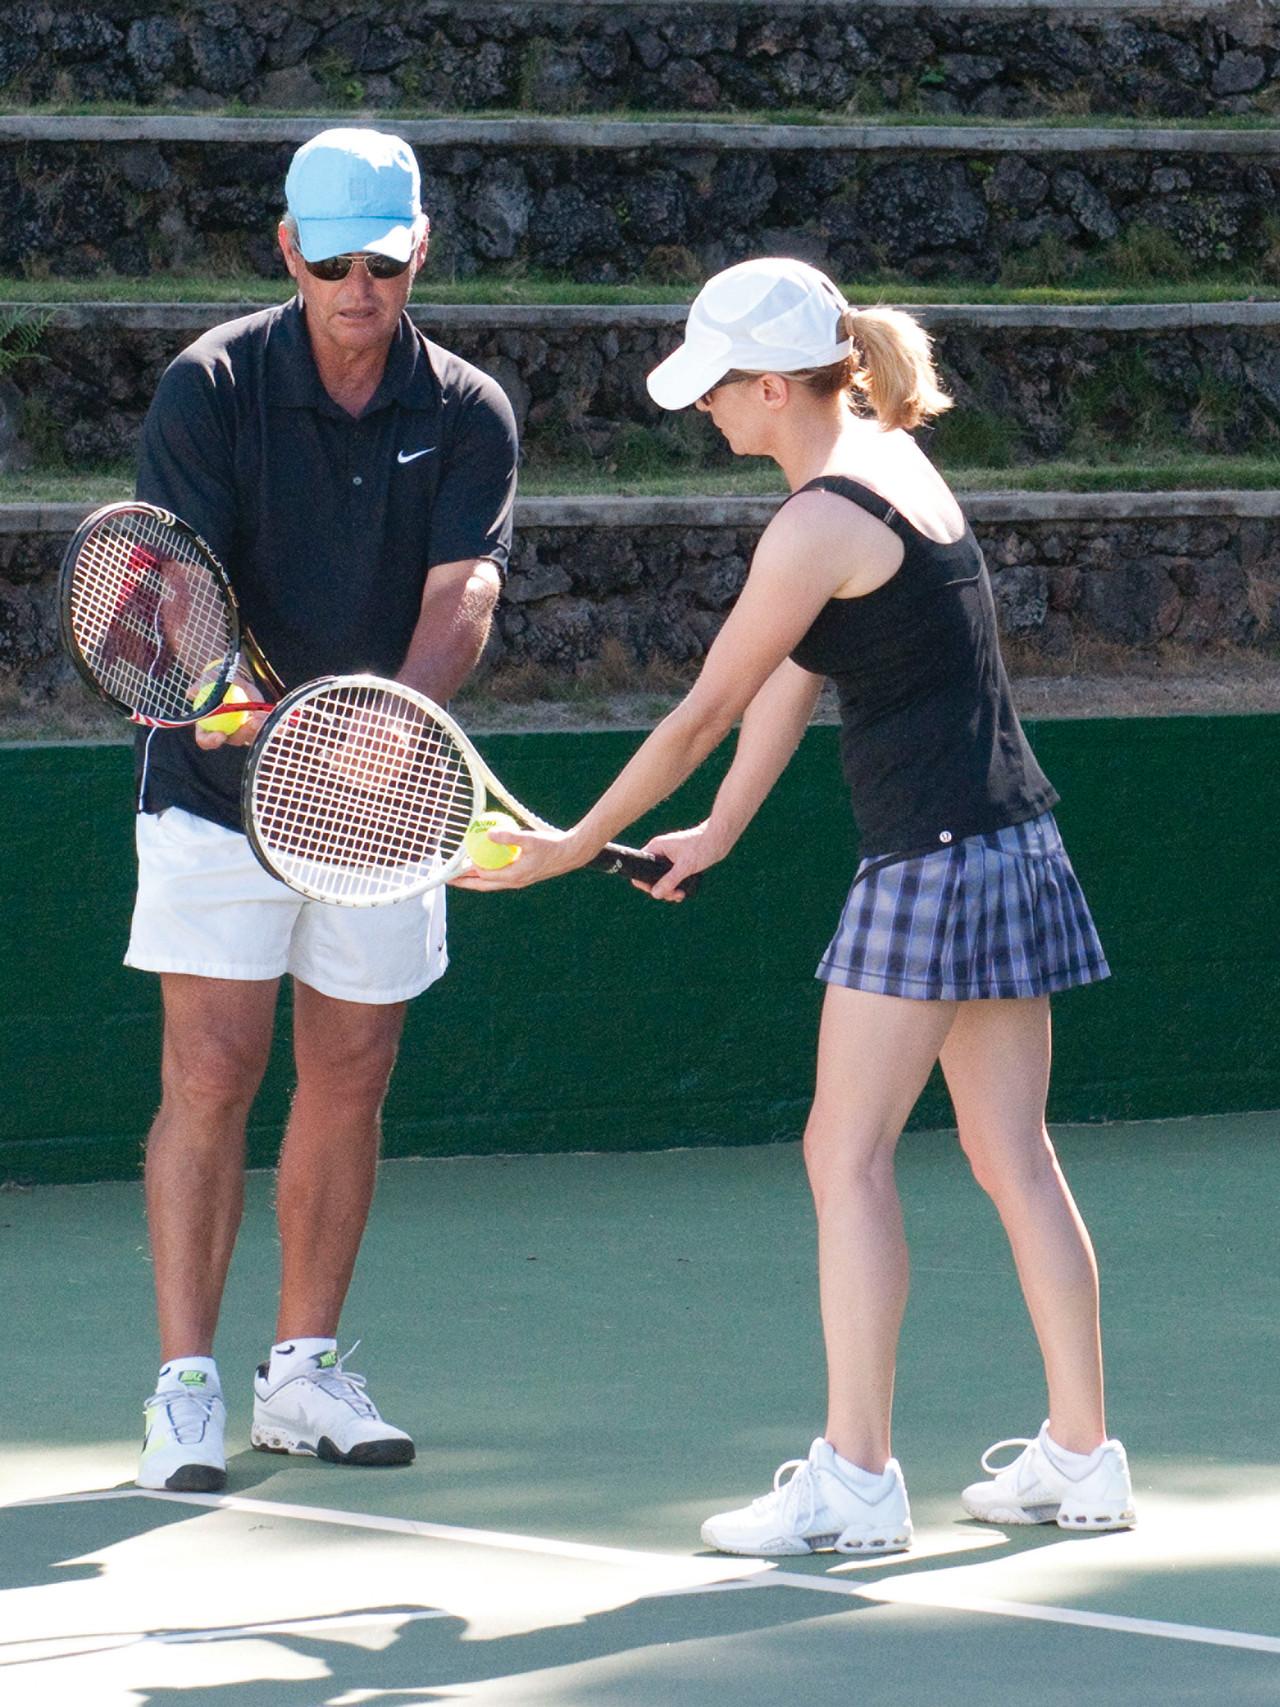 Four Seasons Resort Maui Hosts Wailea Tennis Camp with Top Pros